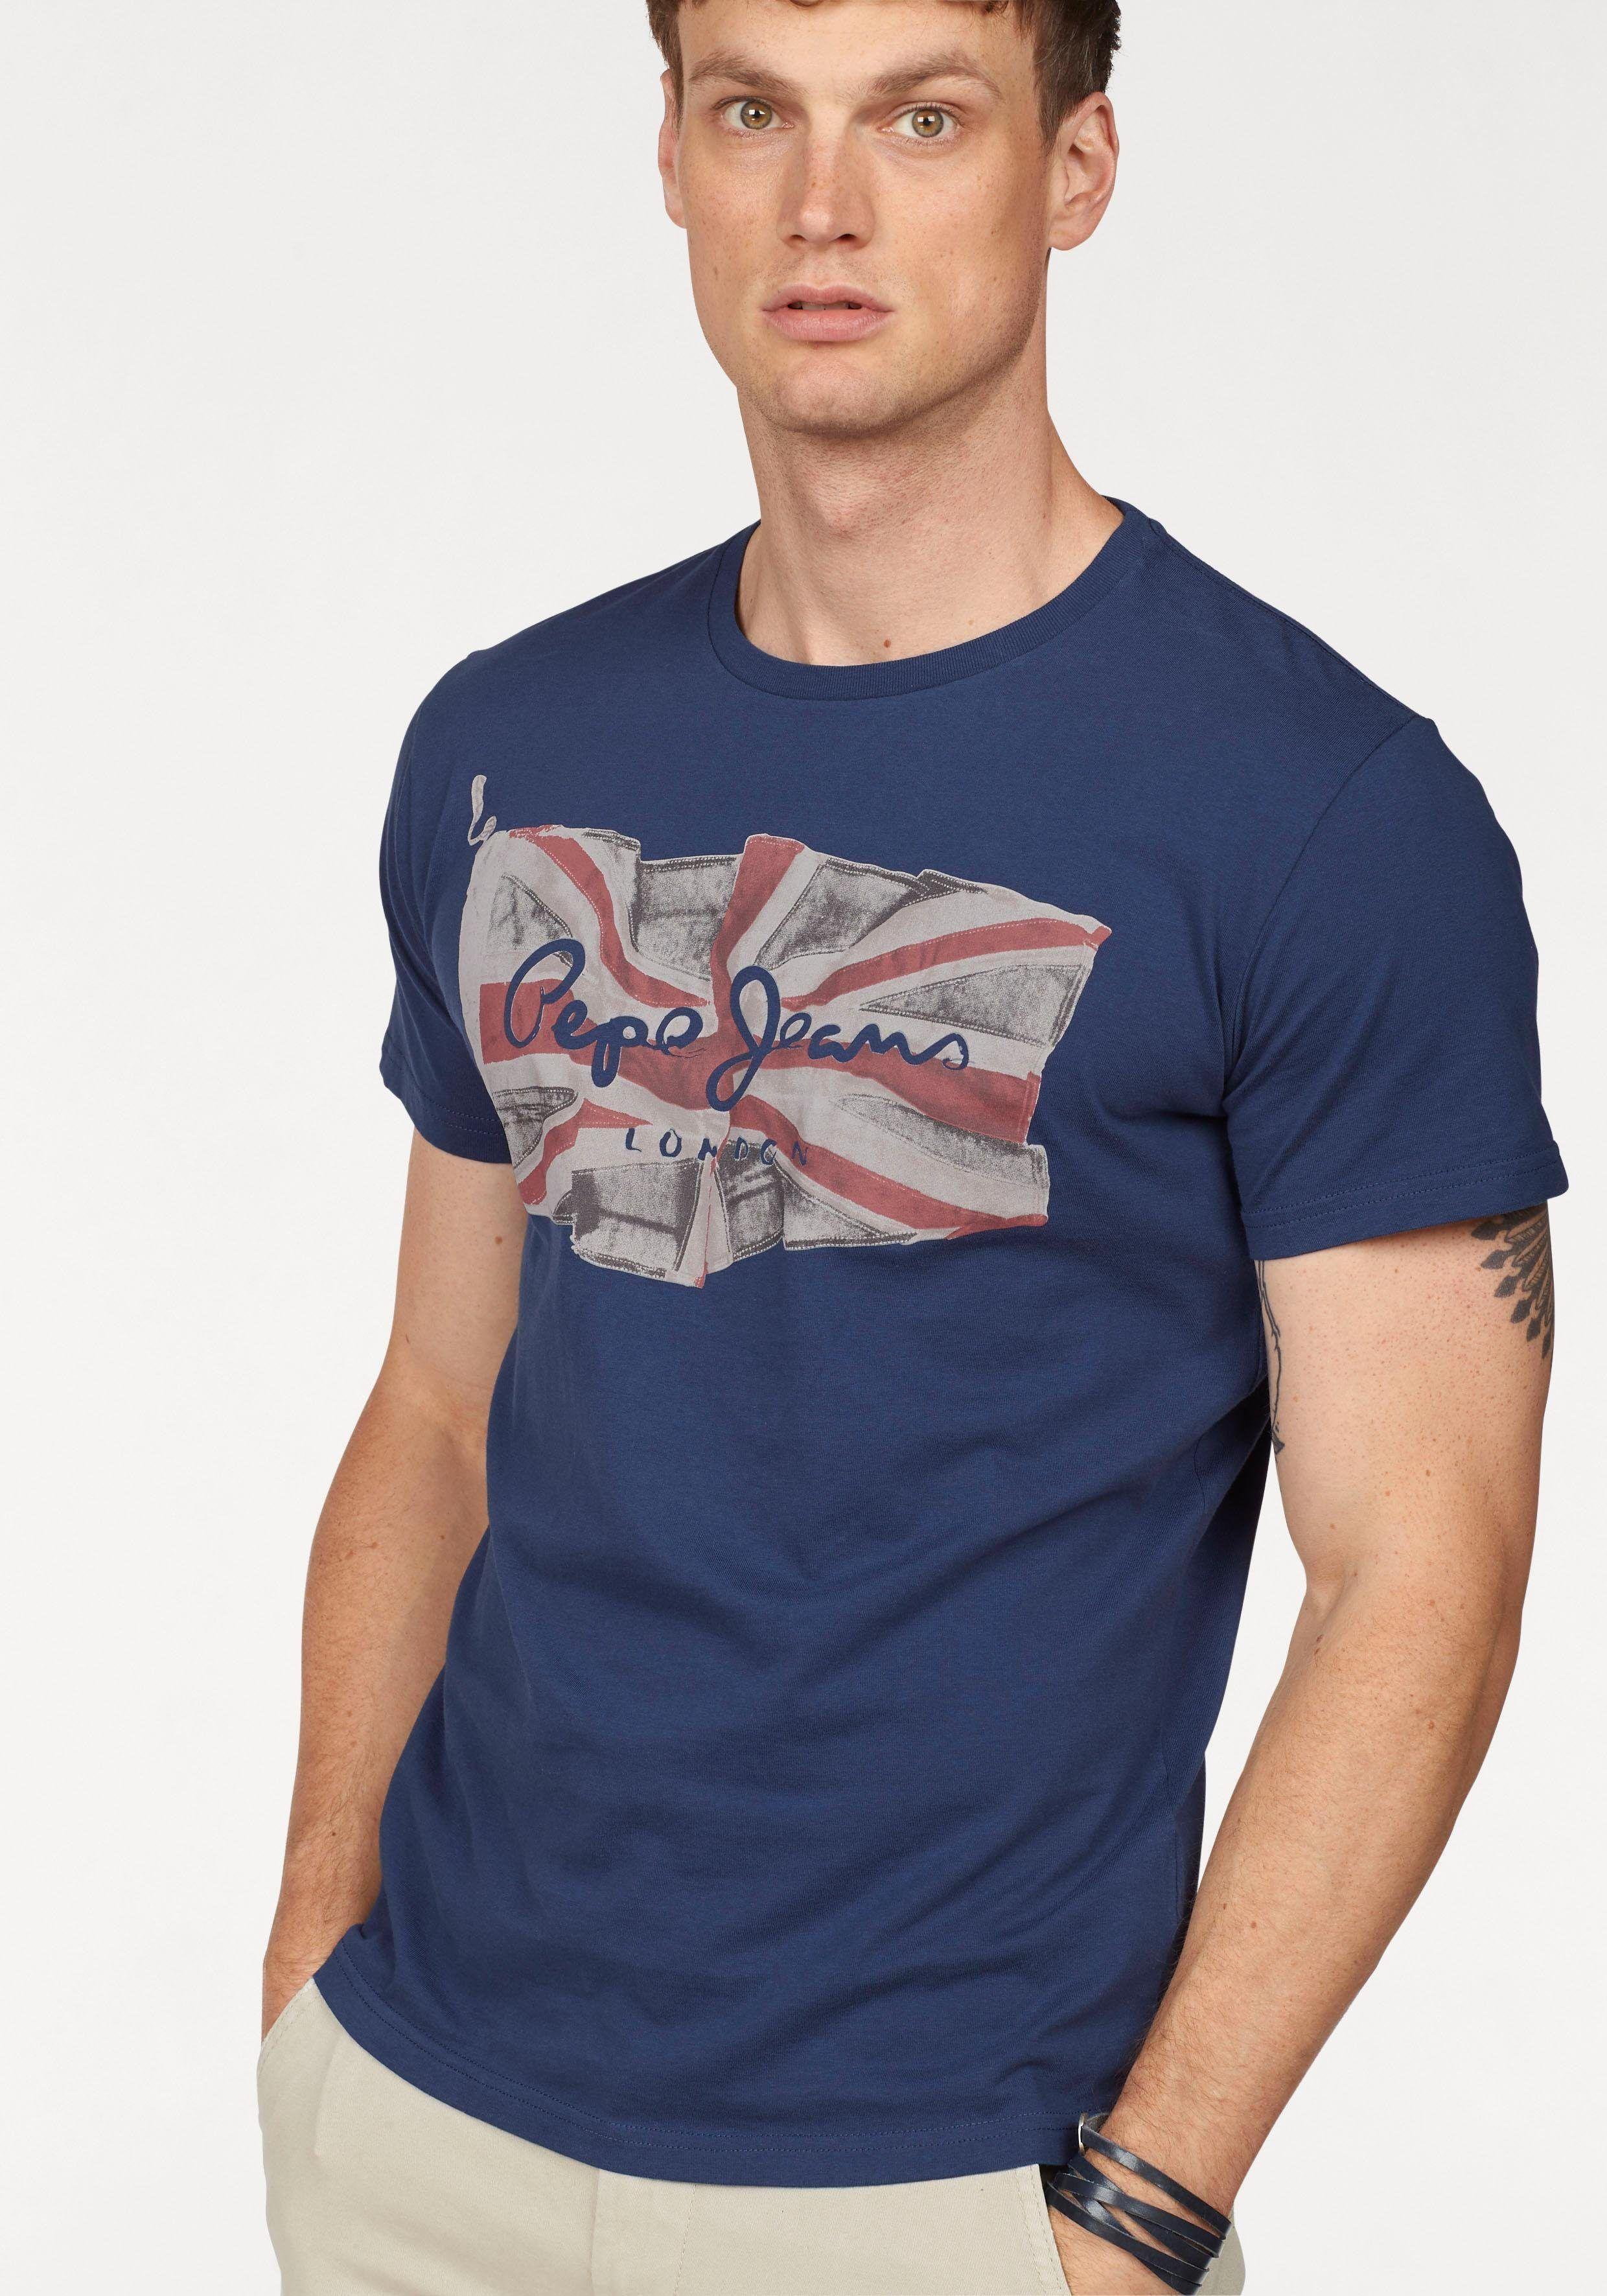 Herren Pepe Jeans T-Shirt FLAG LOGO   08434538602672 - Herren  BekleidungJeansHosenShirtsT-Shirts T 64cb997ca7